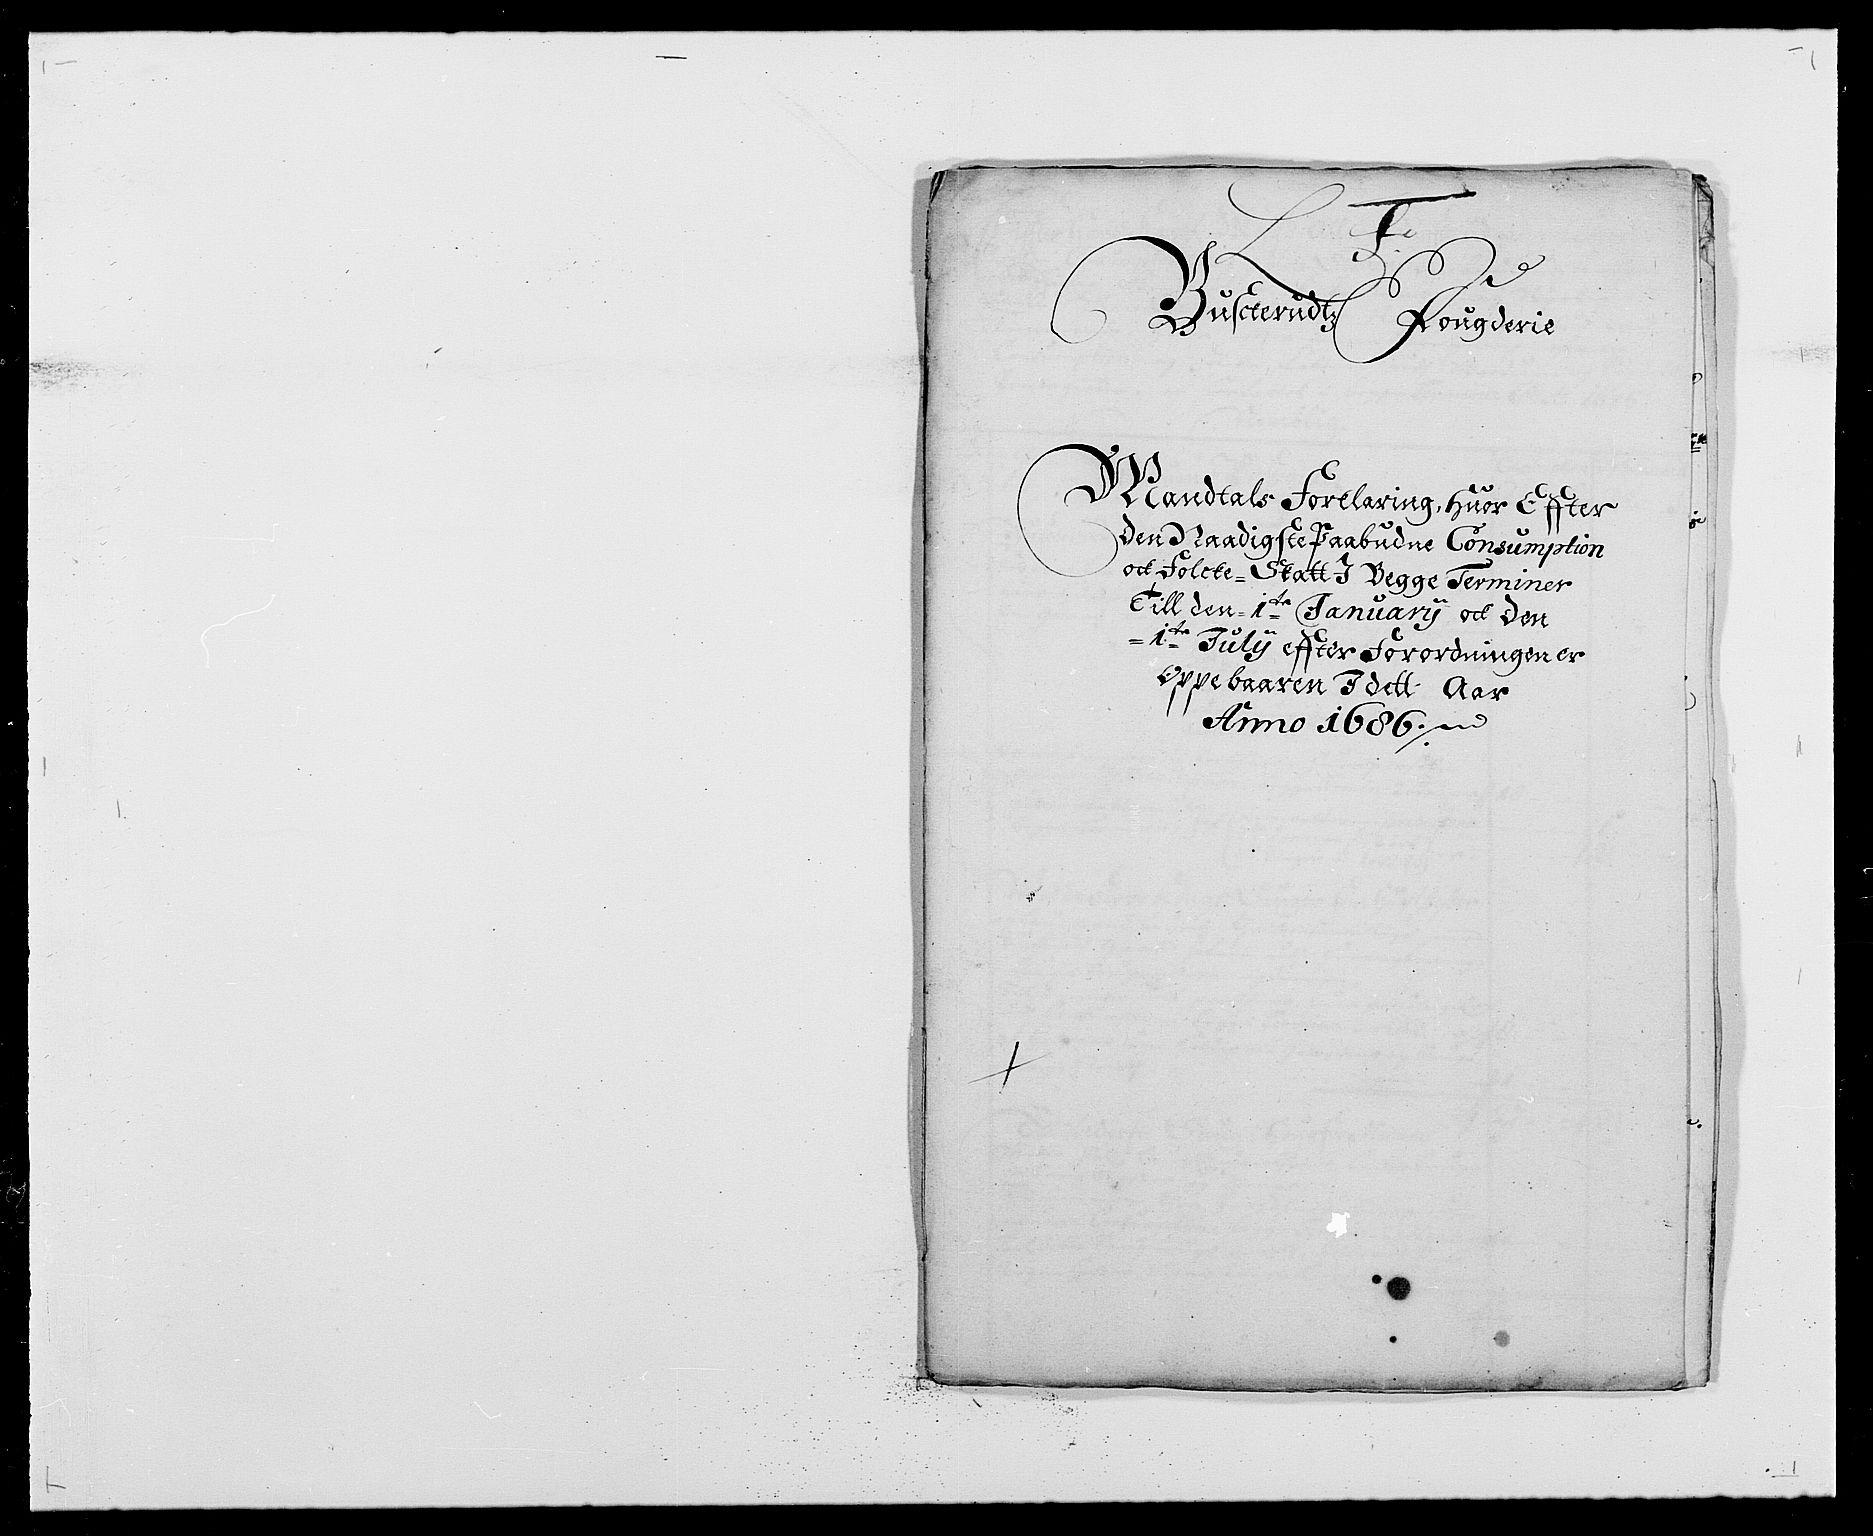 RA, Rentekammeret inntil 1814, Reviderte regnskaper, Fogderegnskap, R25/L1678: Fogderegnskap Buskerud, 1685-1686, s. 342